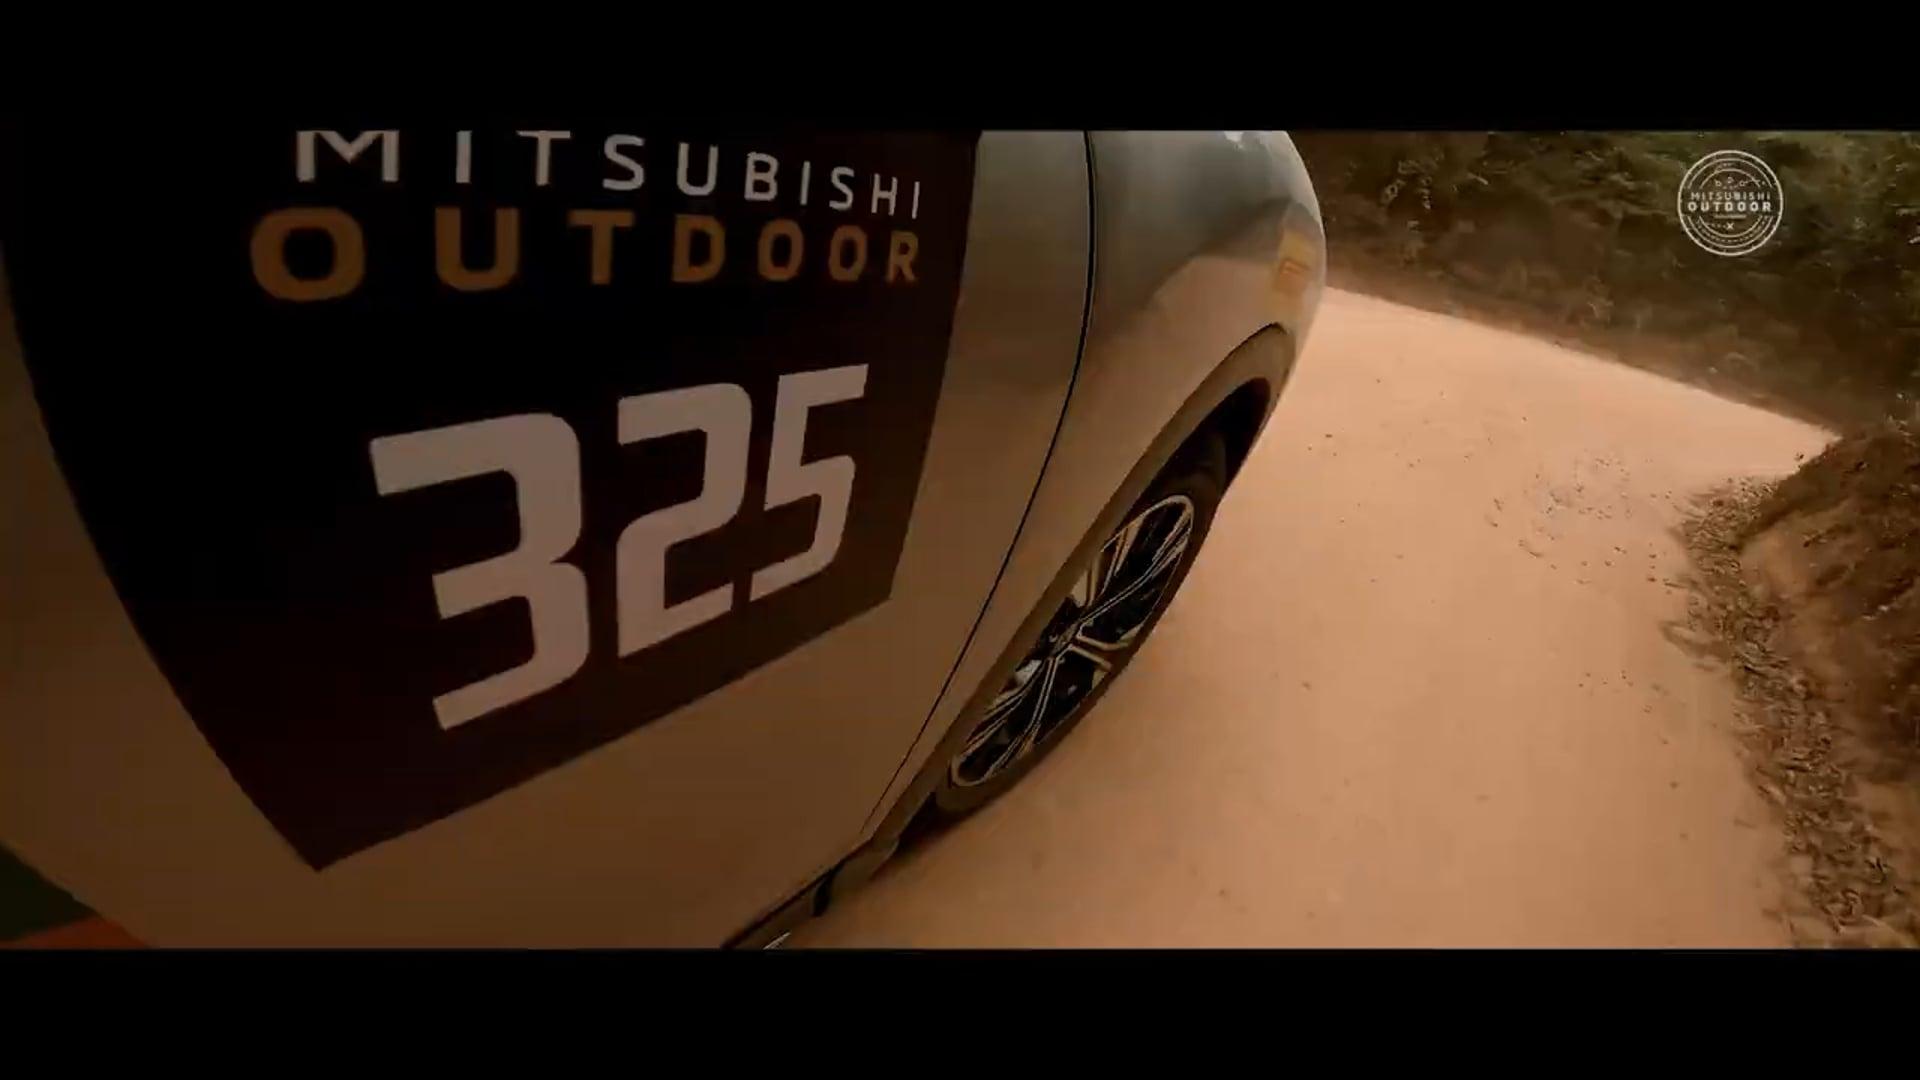 MITSUBISHI - Outdoors